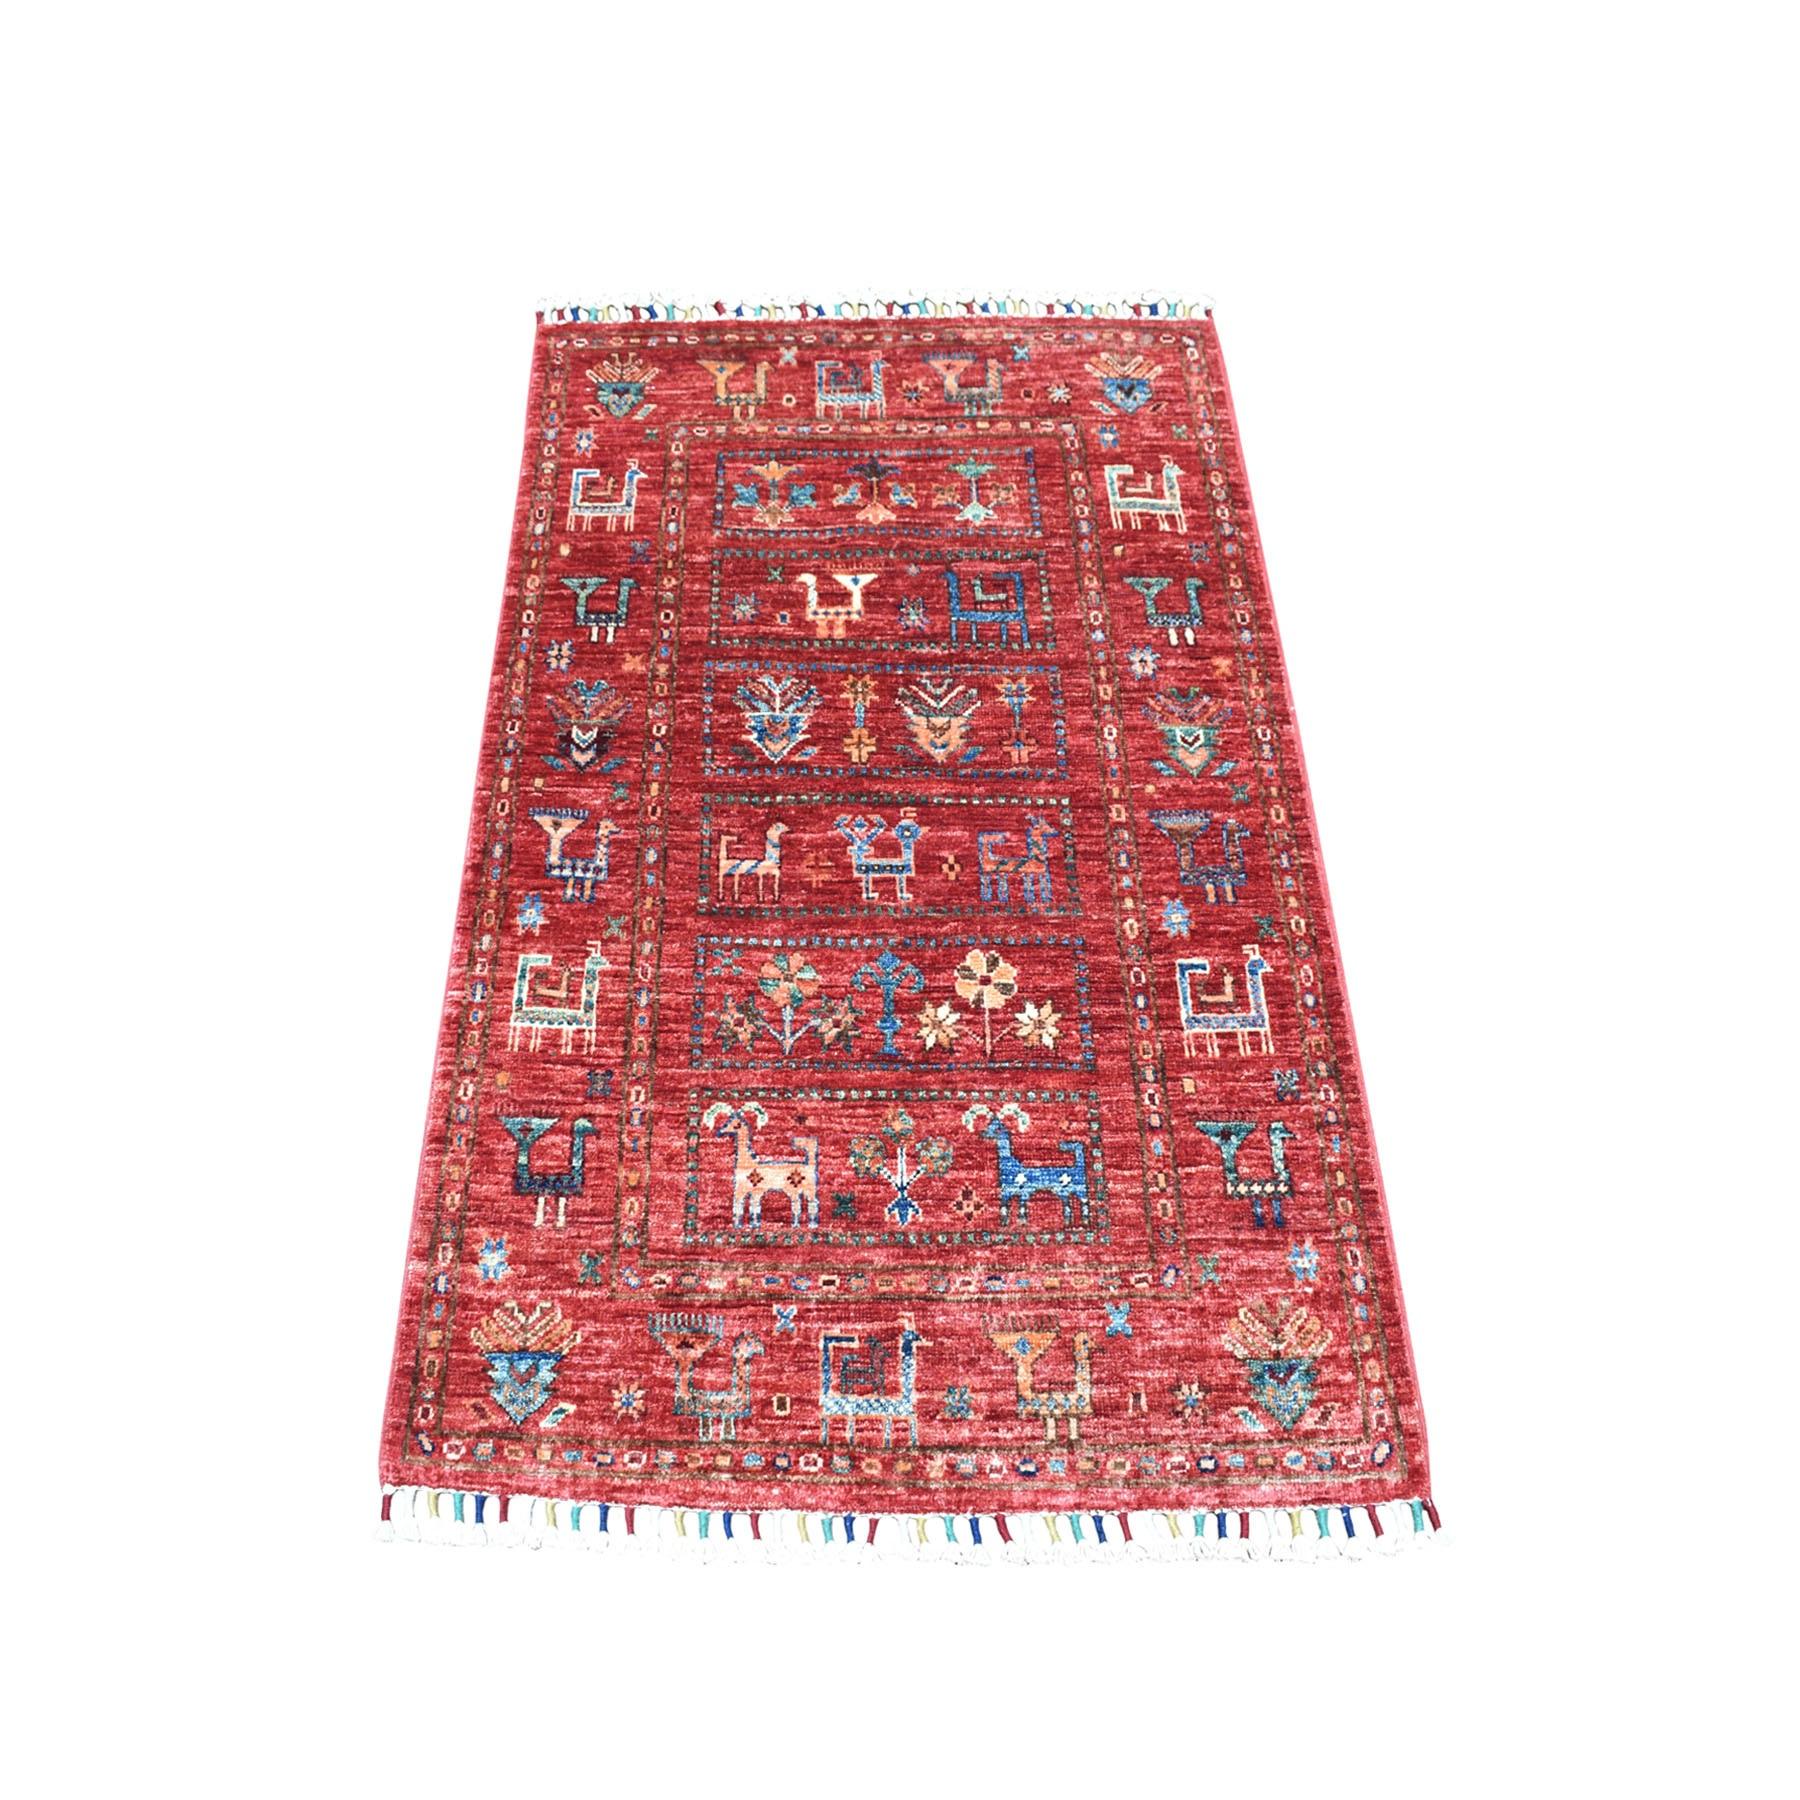 "2'8""x4'1"" Khorjin Design Red Super Kazak Pure Wool Hand Knotted Oriental Rug"